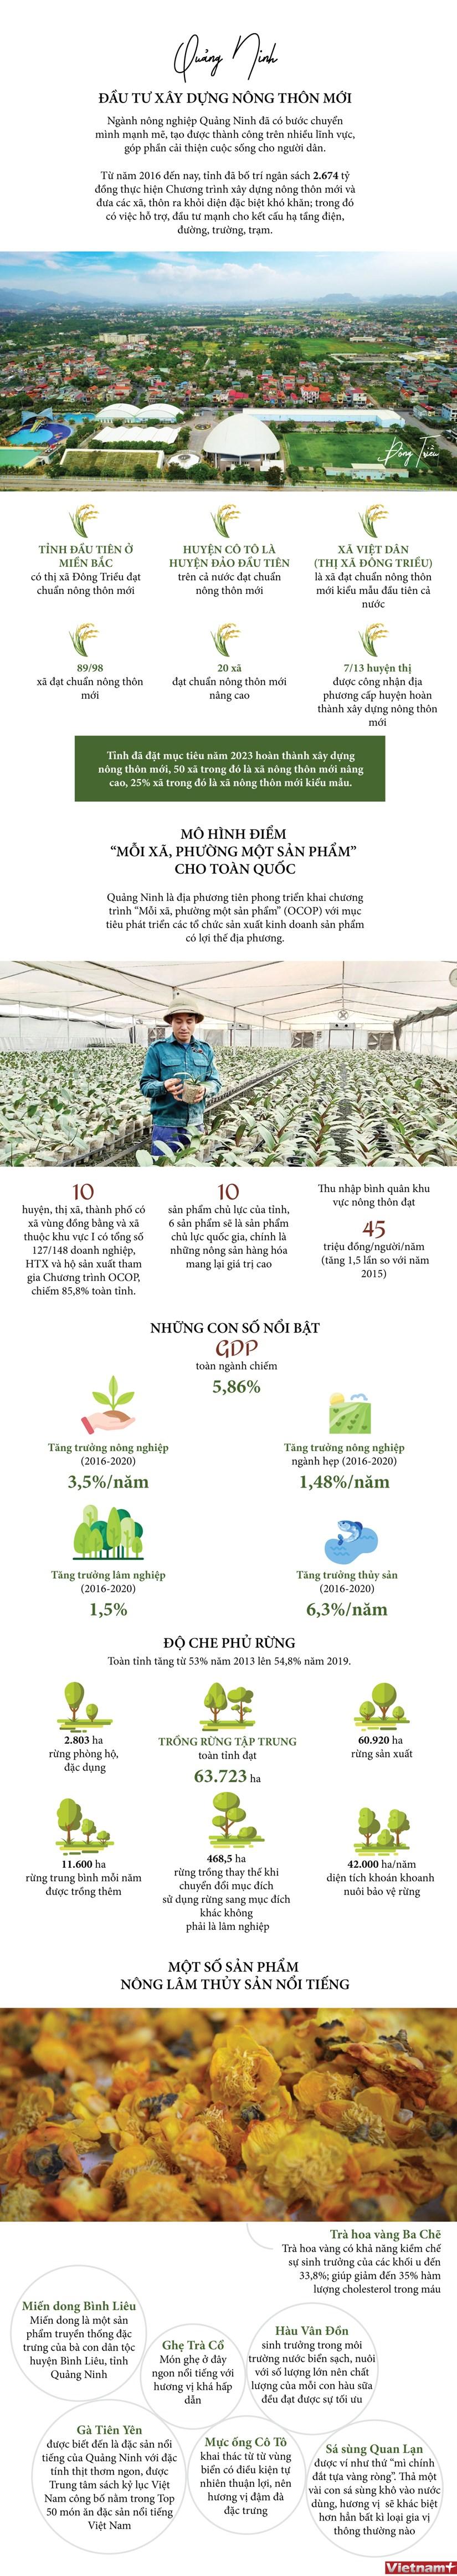 [Infographics] Quang Ninh day manh dau tu xay dung nong thon moi hinh anh 1